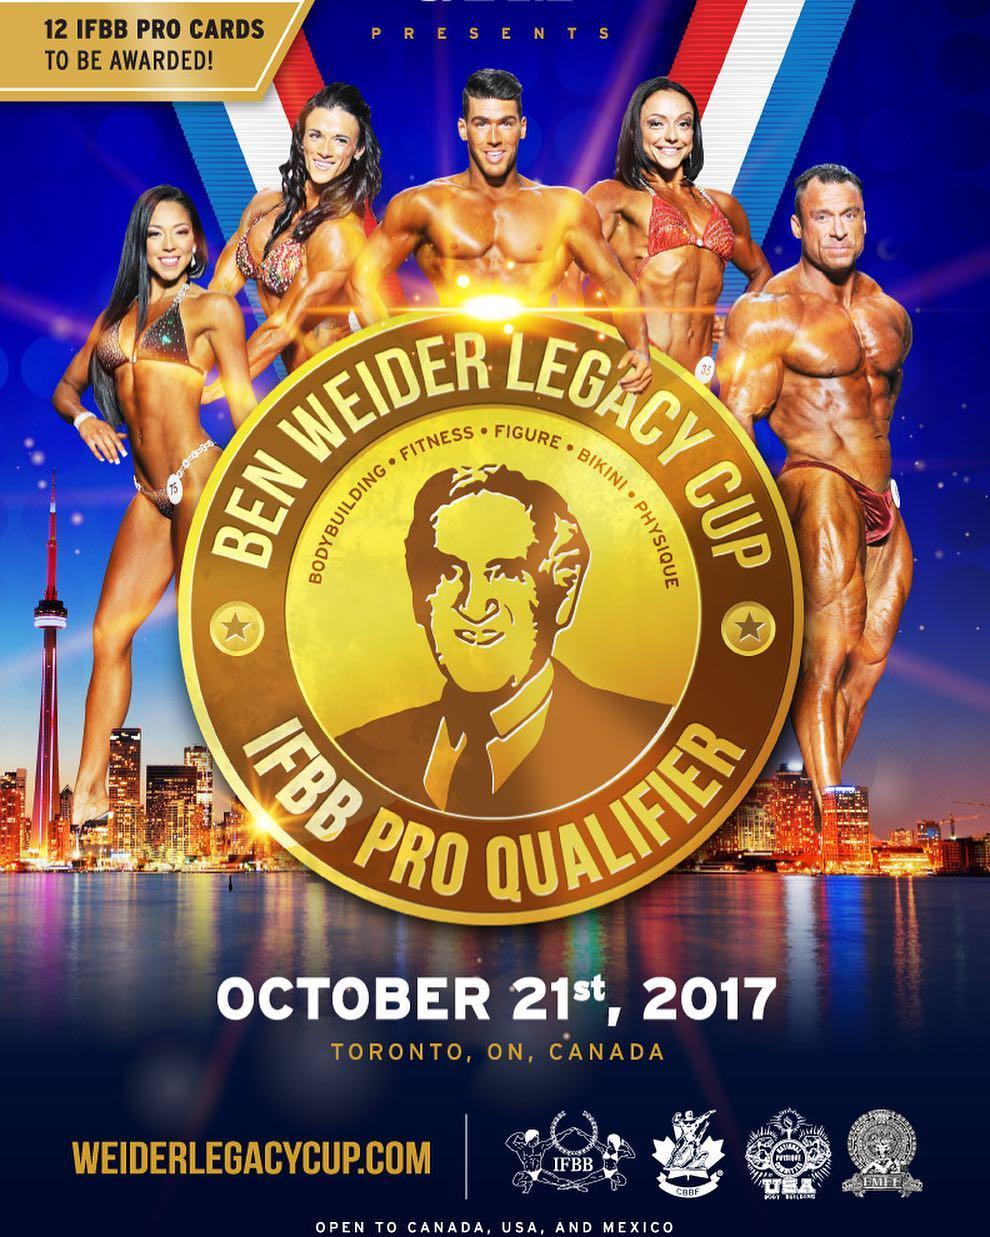 TORONTO-BEN WEIDER LEGACY CUP 2017